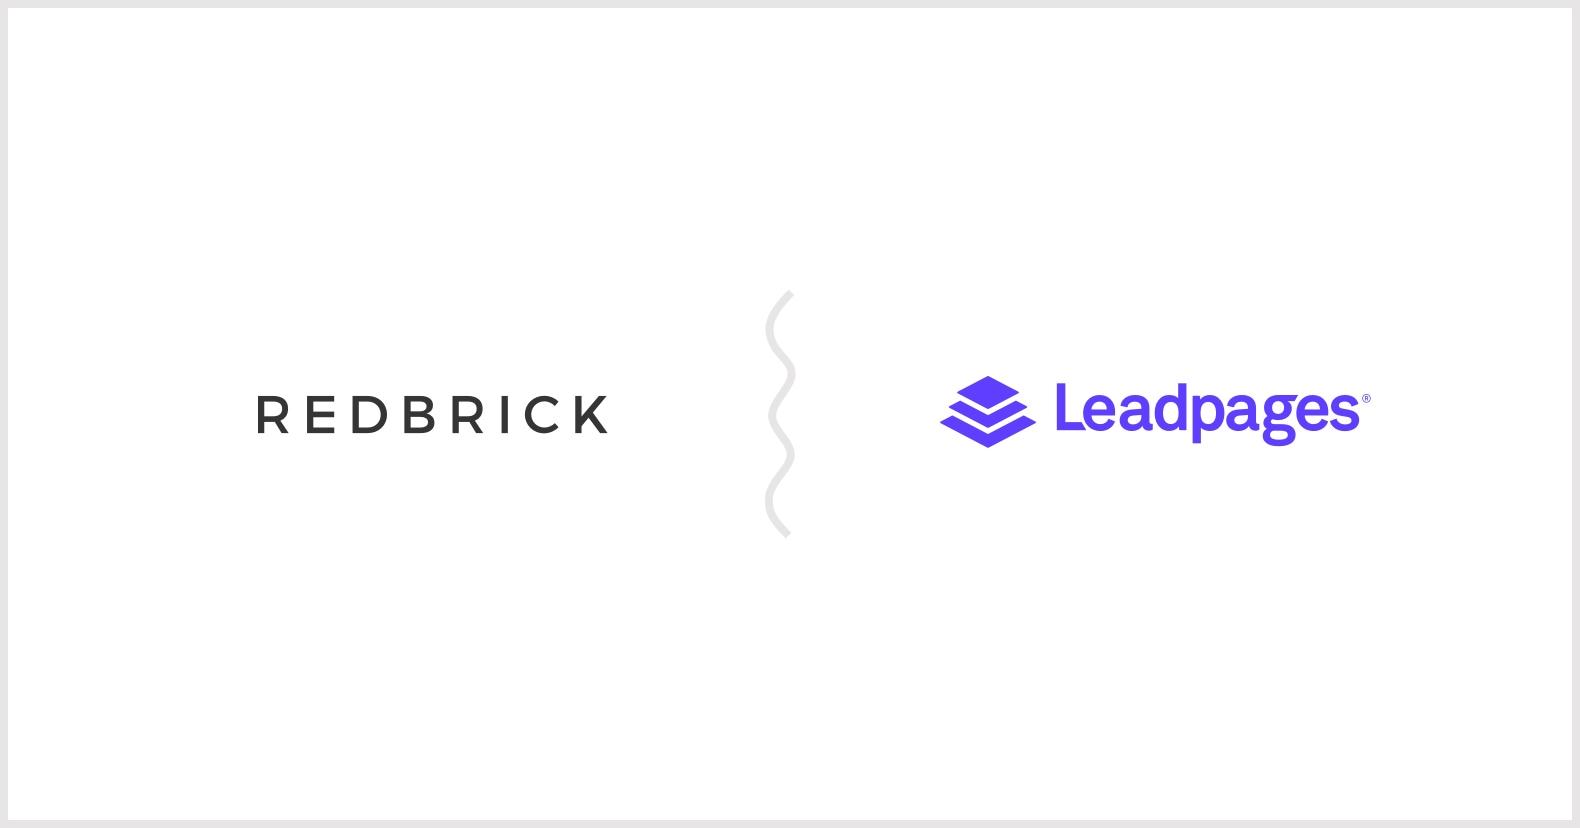 Leadpages joins Redbrick